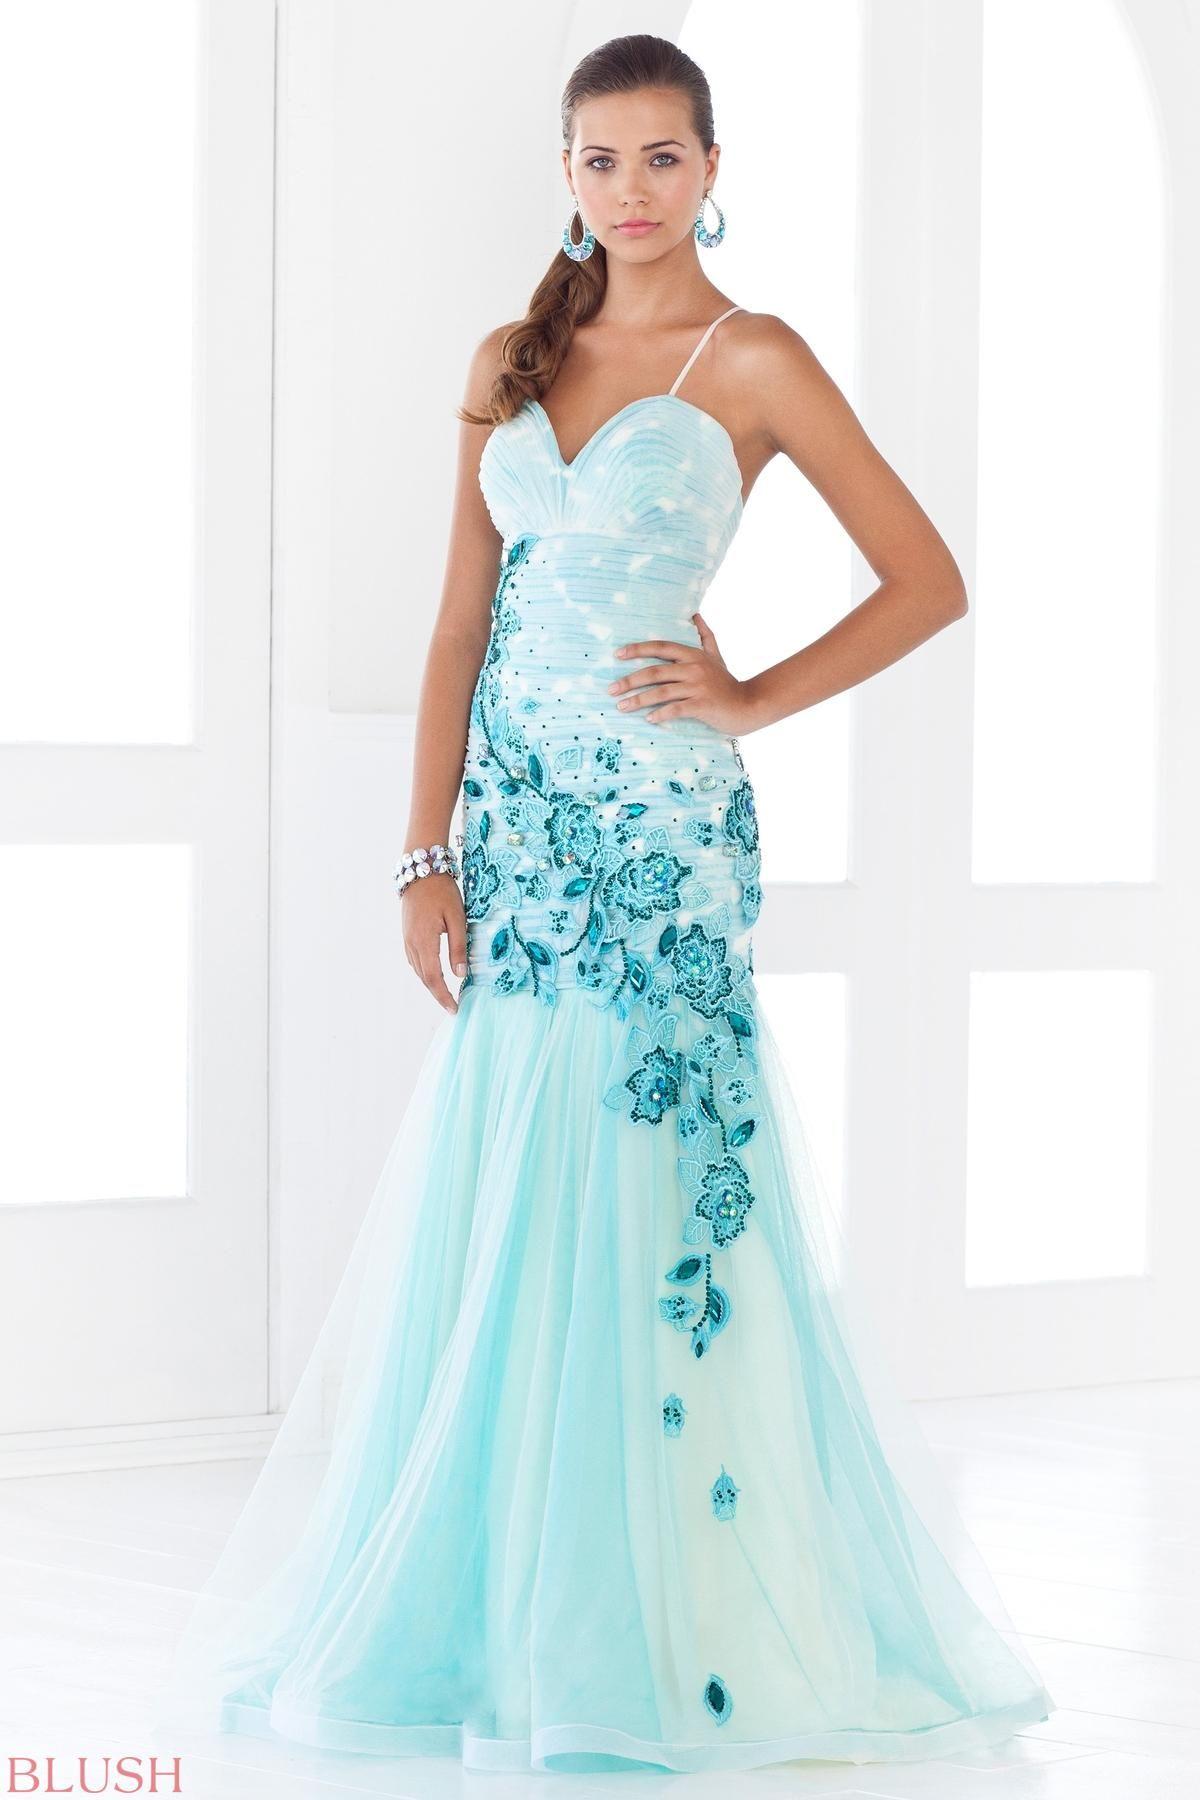 Soooo pretty prom dresses pinterest ombre gown blush prom